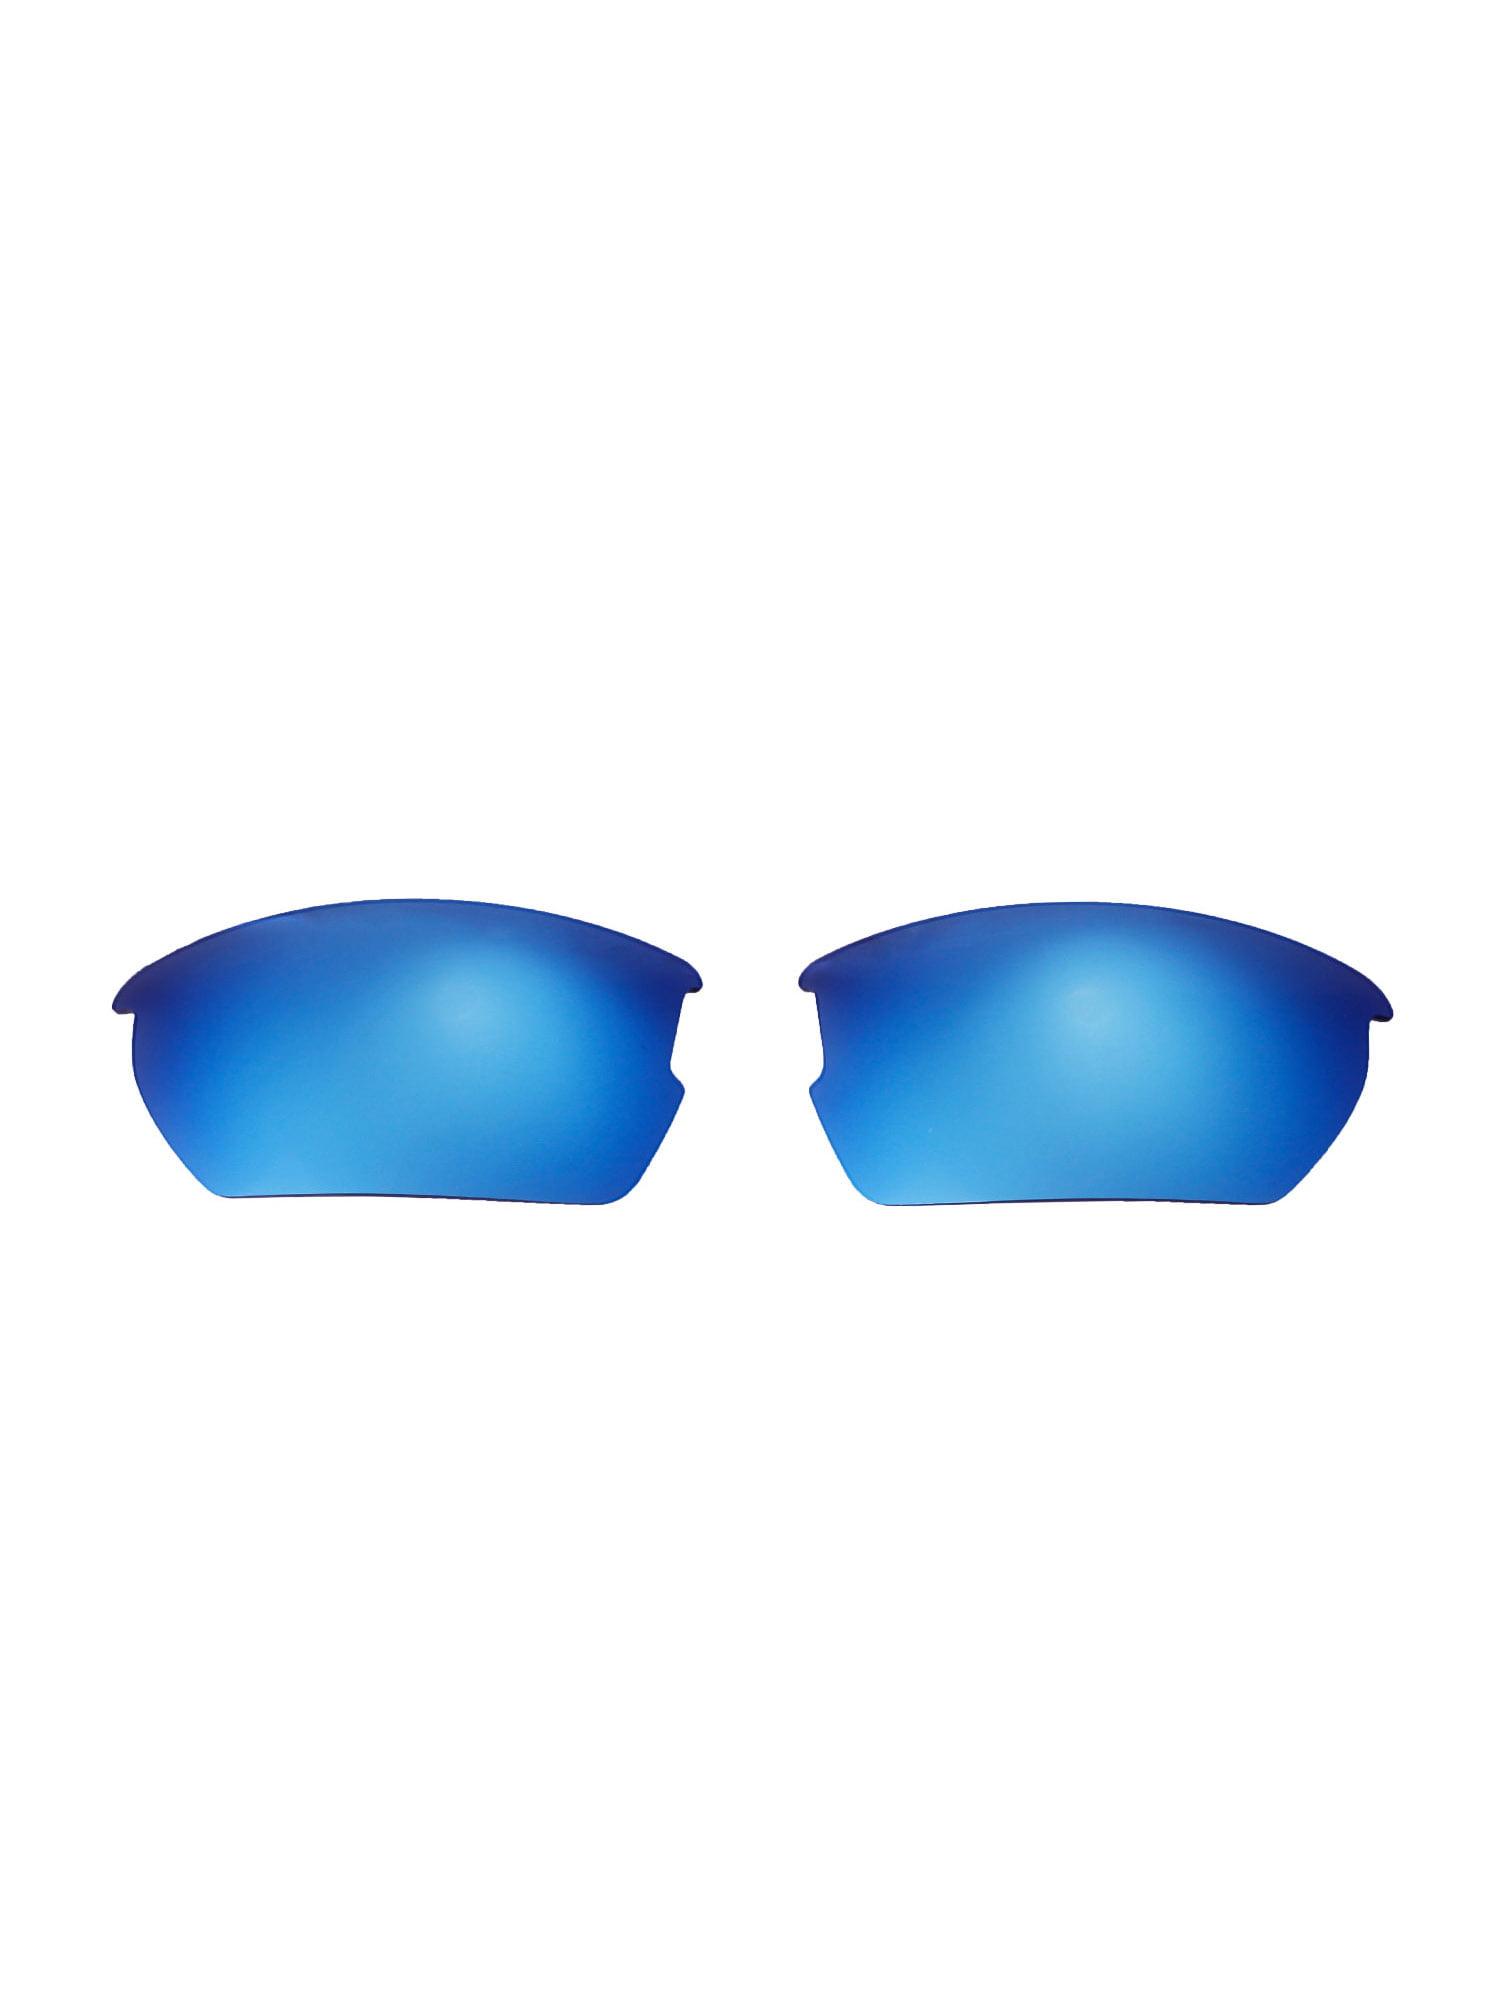 04a8da25ad Walleva - Walleva Titanium ISARC Polarized Replacement Lenses for Wiley X  Valor Sunglasses - Walmart.com